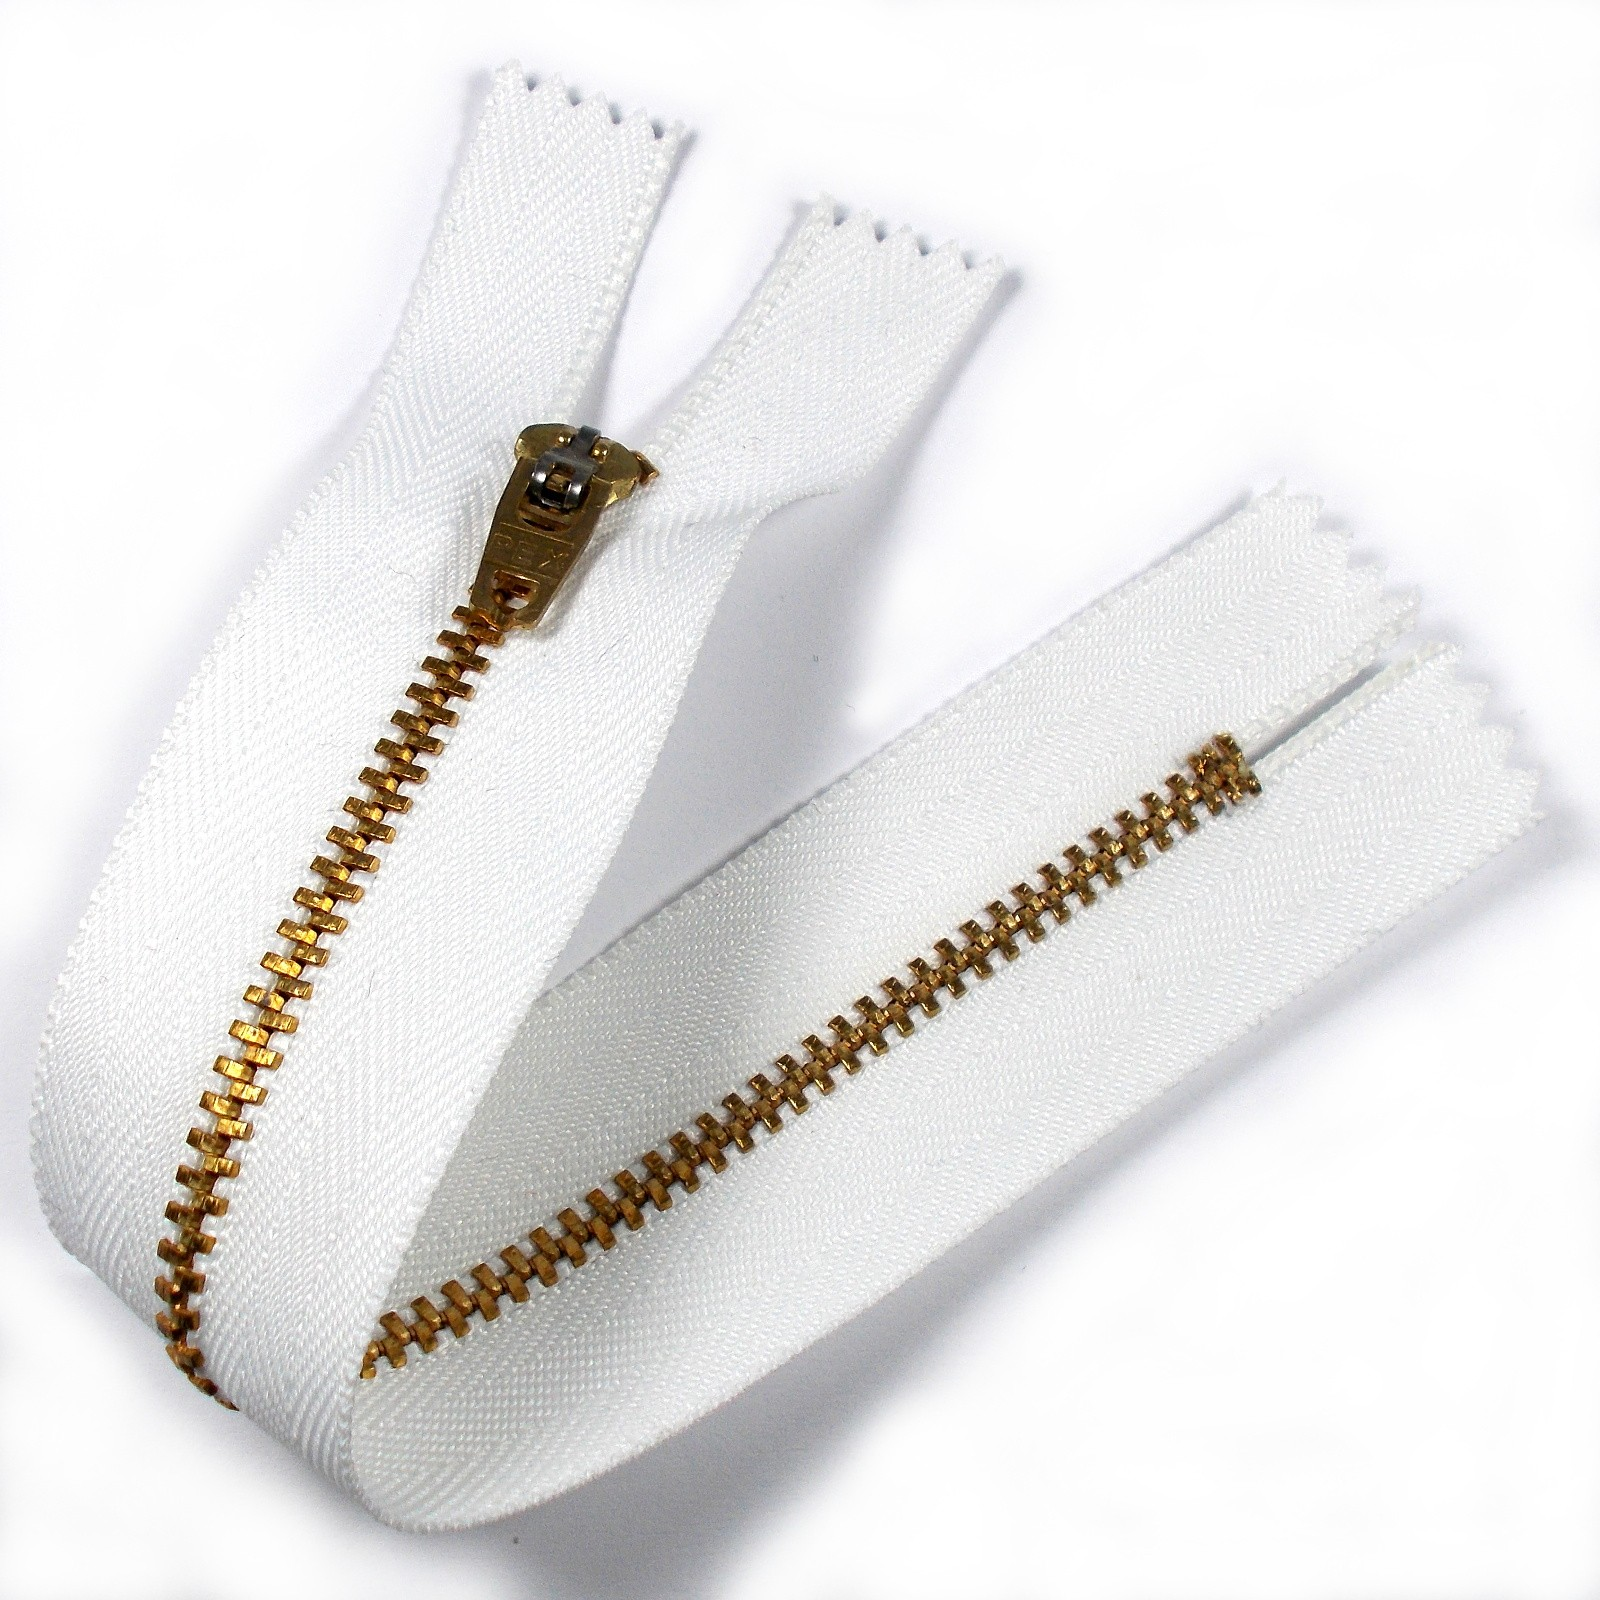 Gold Metal Trouser Jeans Zip Zipper 7 inch White